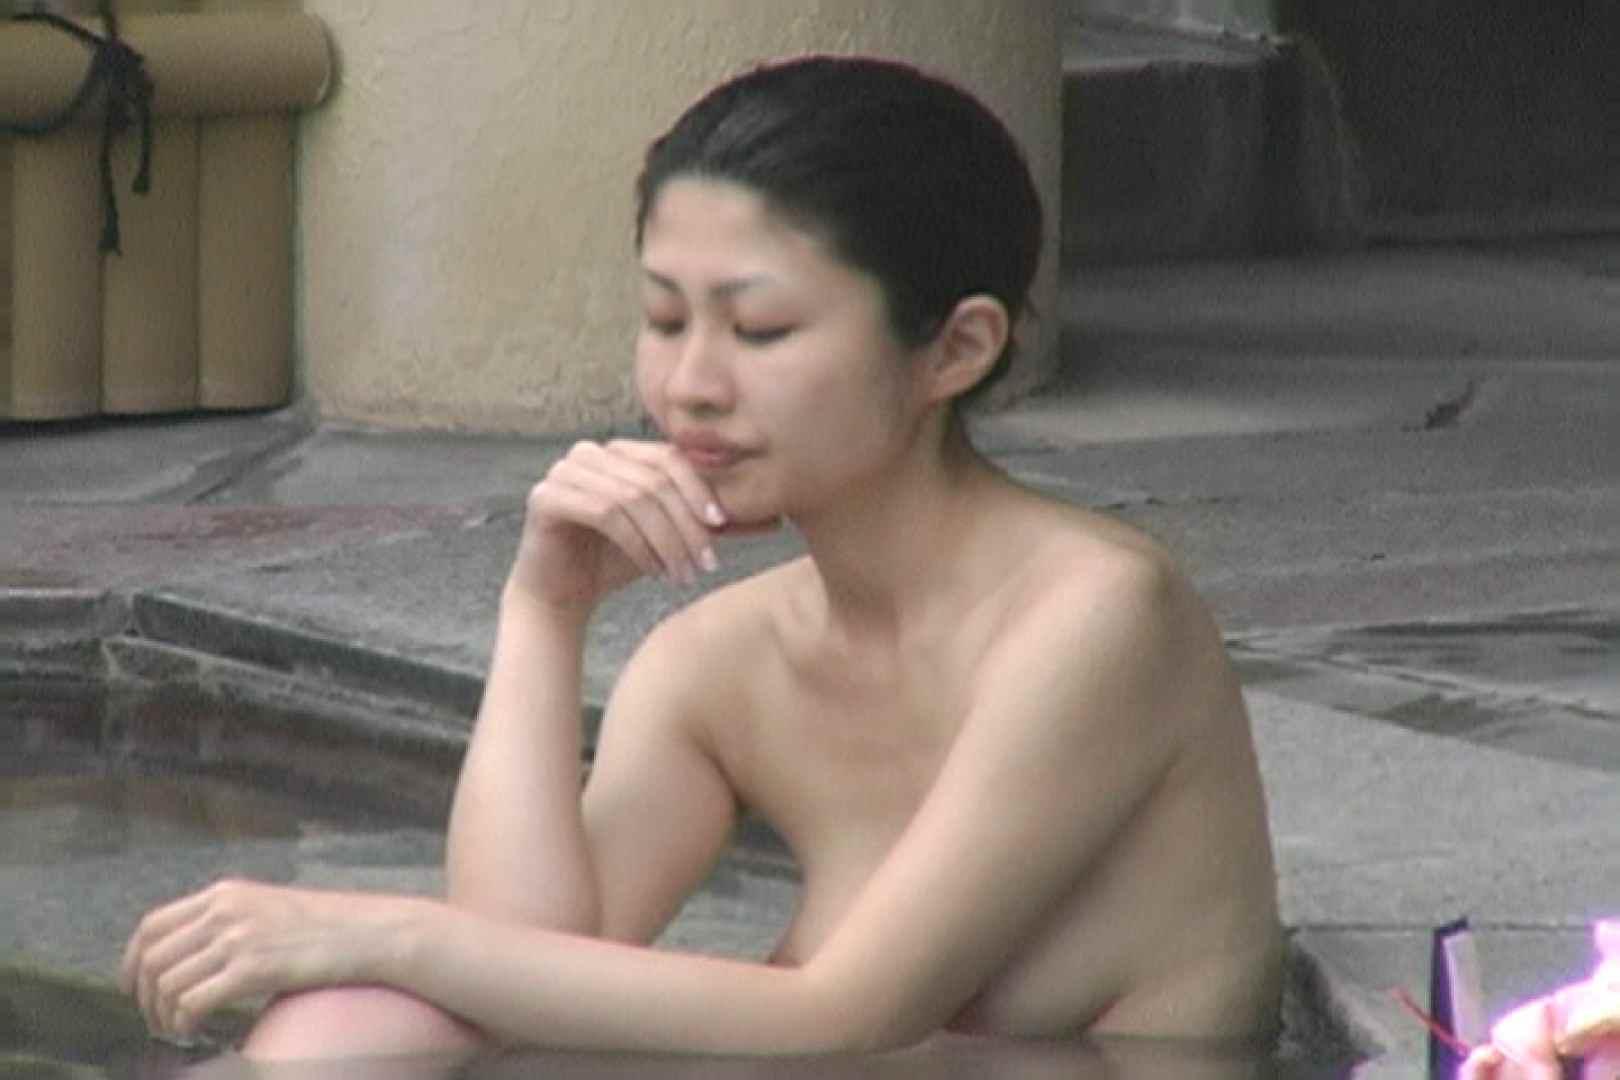 Aquaな露天風呂Vol.642 盗撮師作品 セックス画像 86pic 50